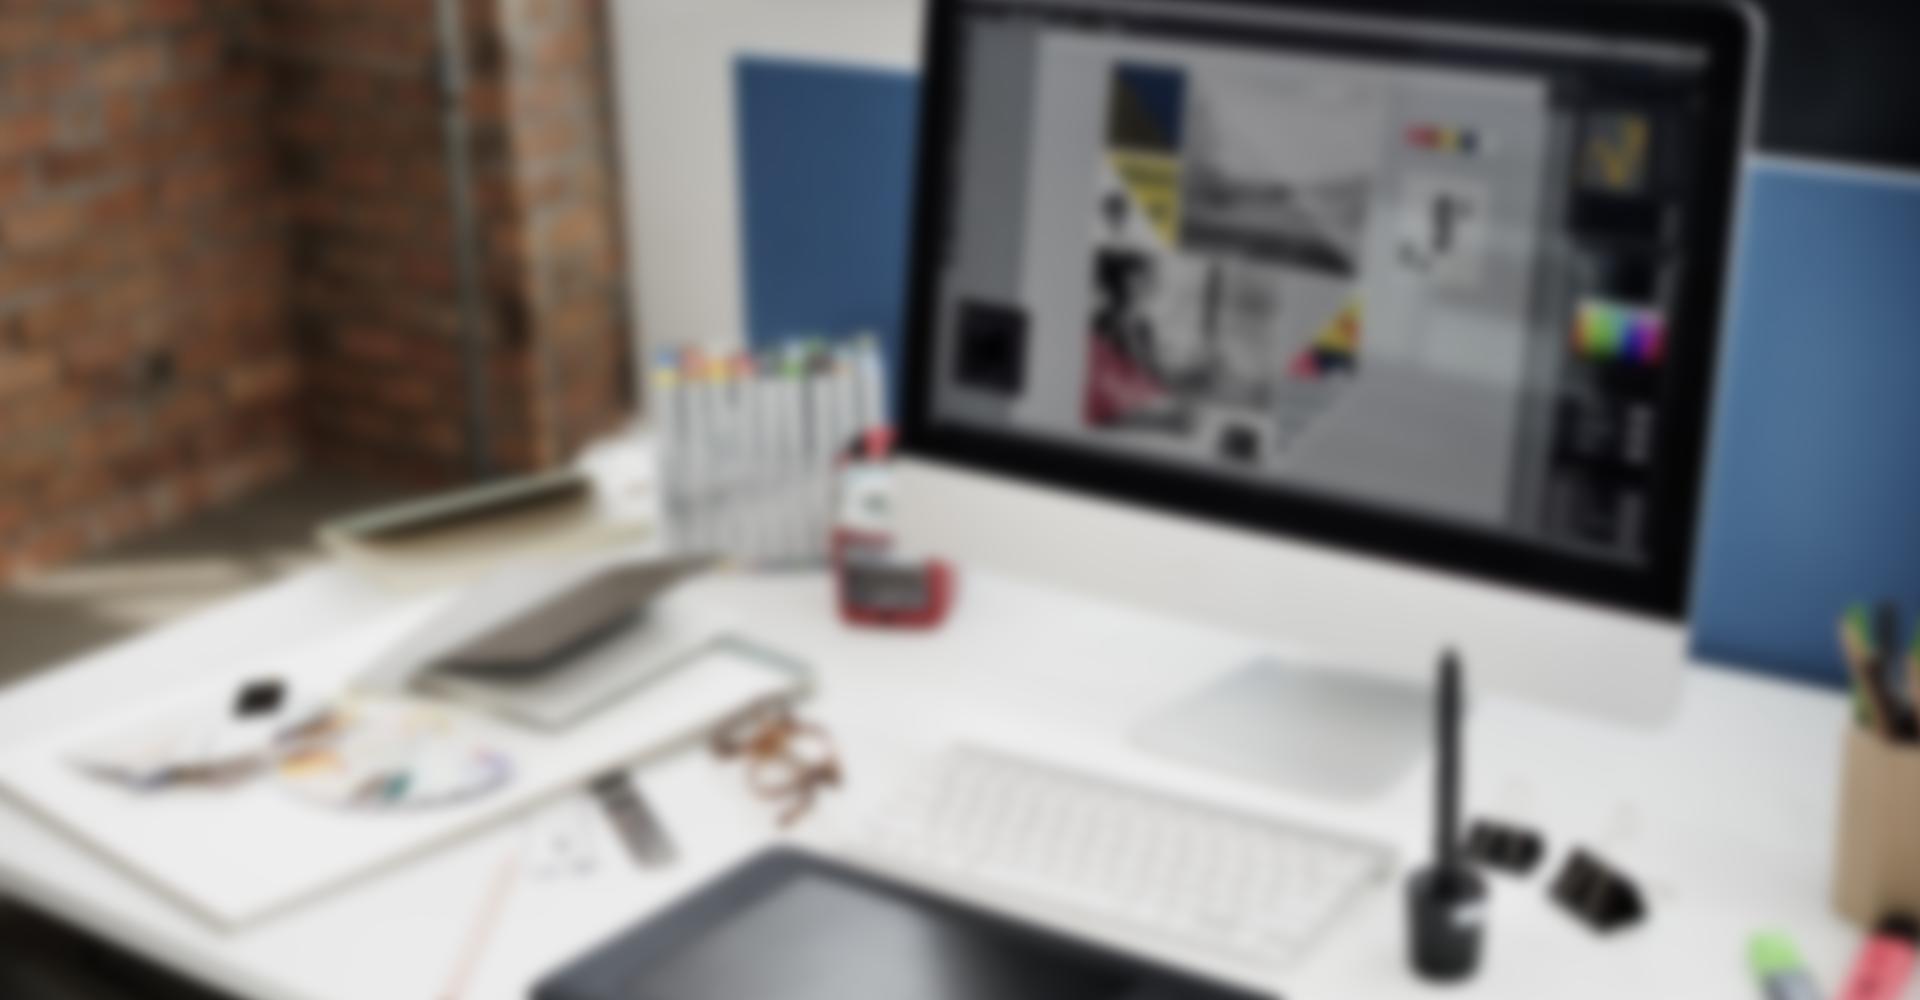 Graphic Design & Print Services